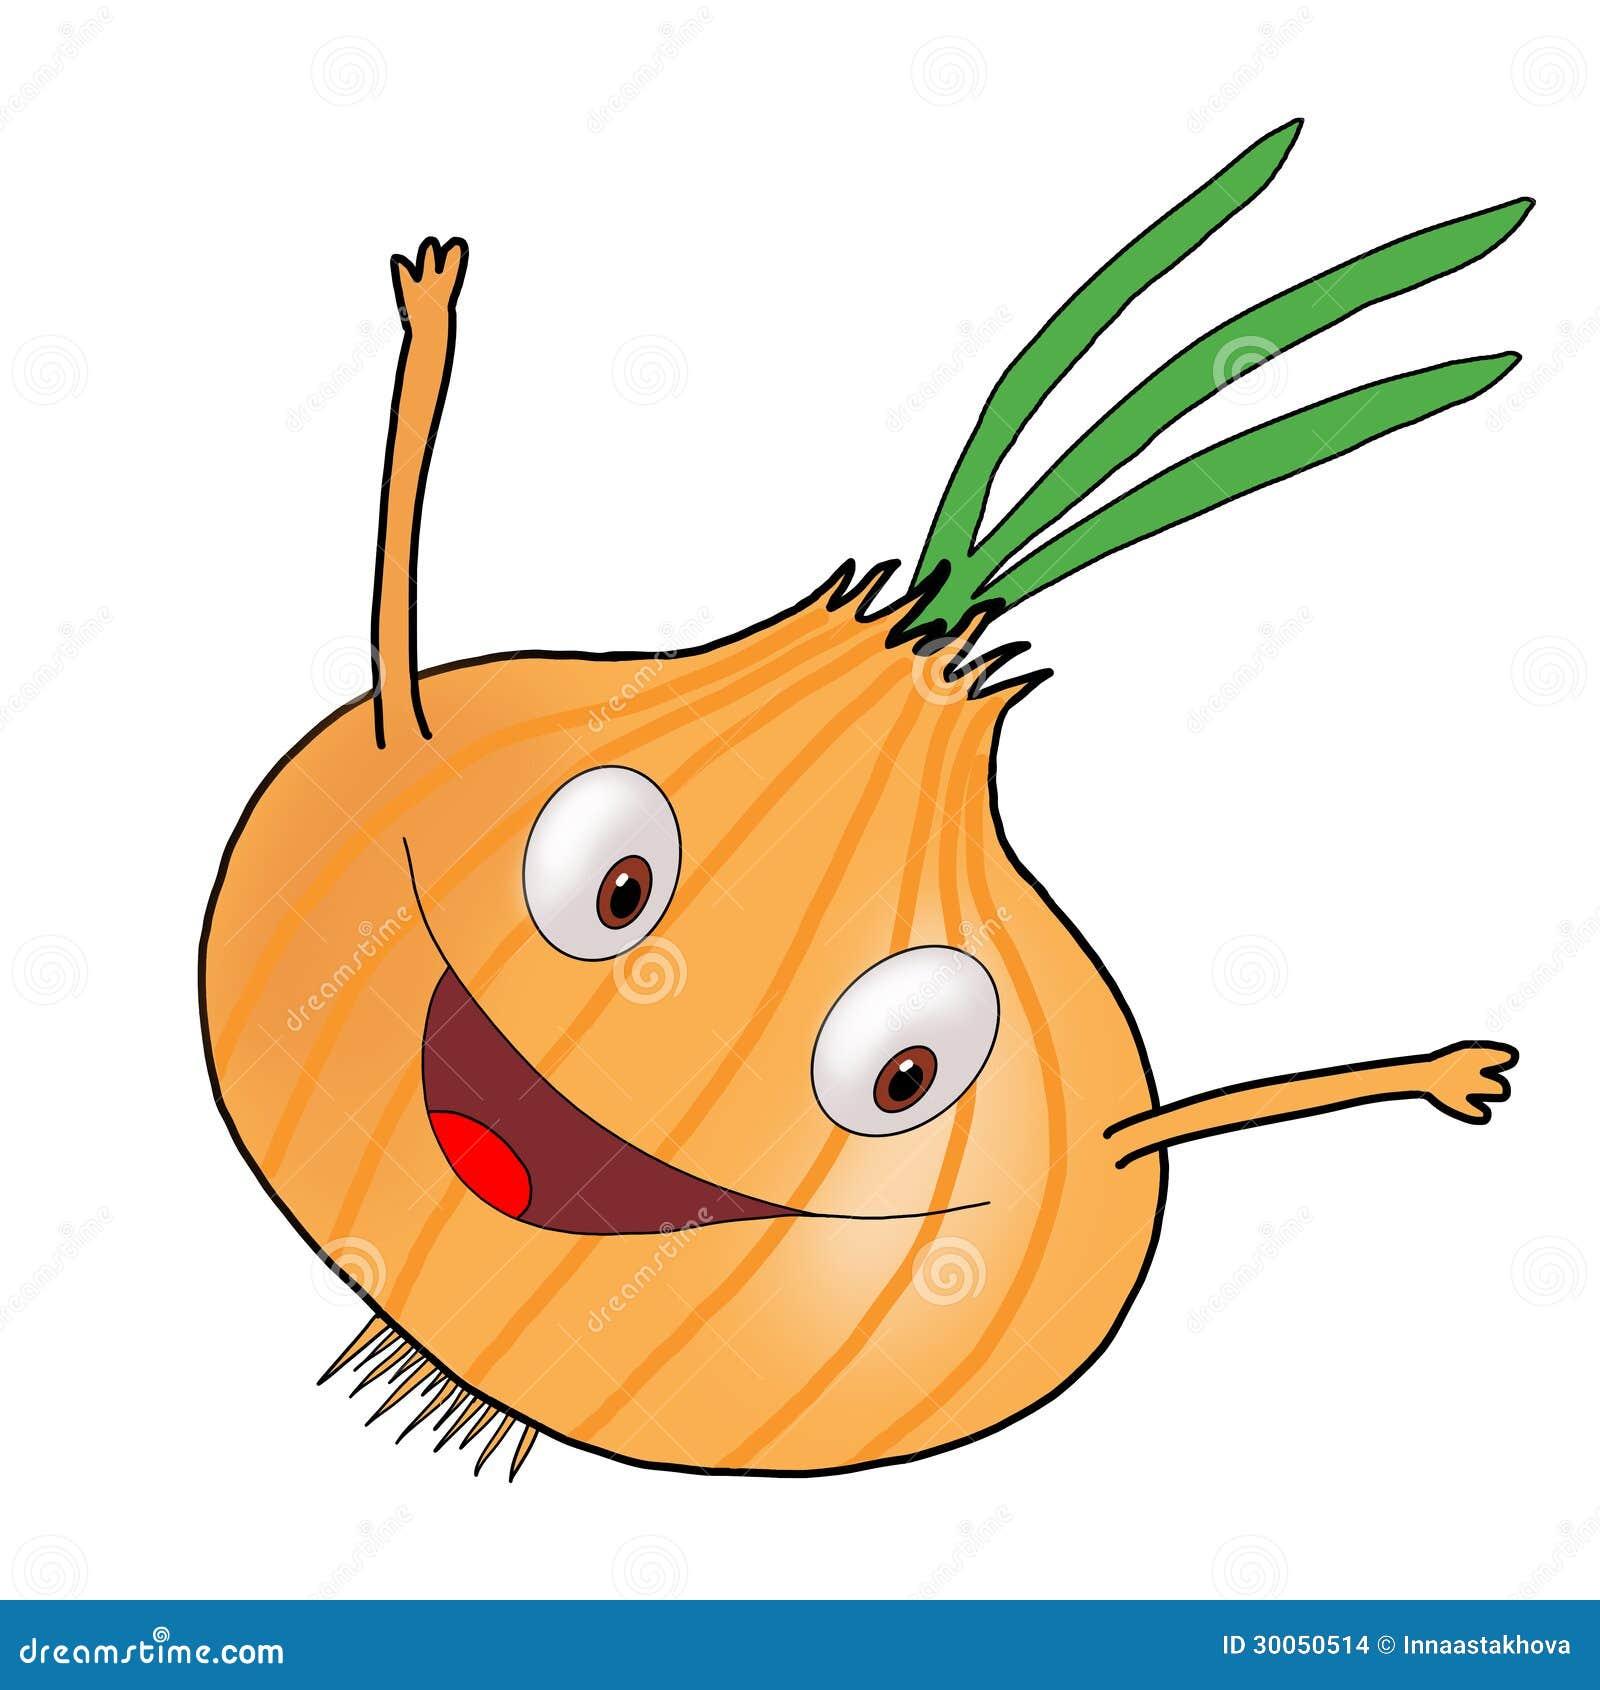 Image Gallery onion cartoon drawing